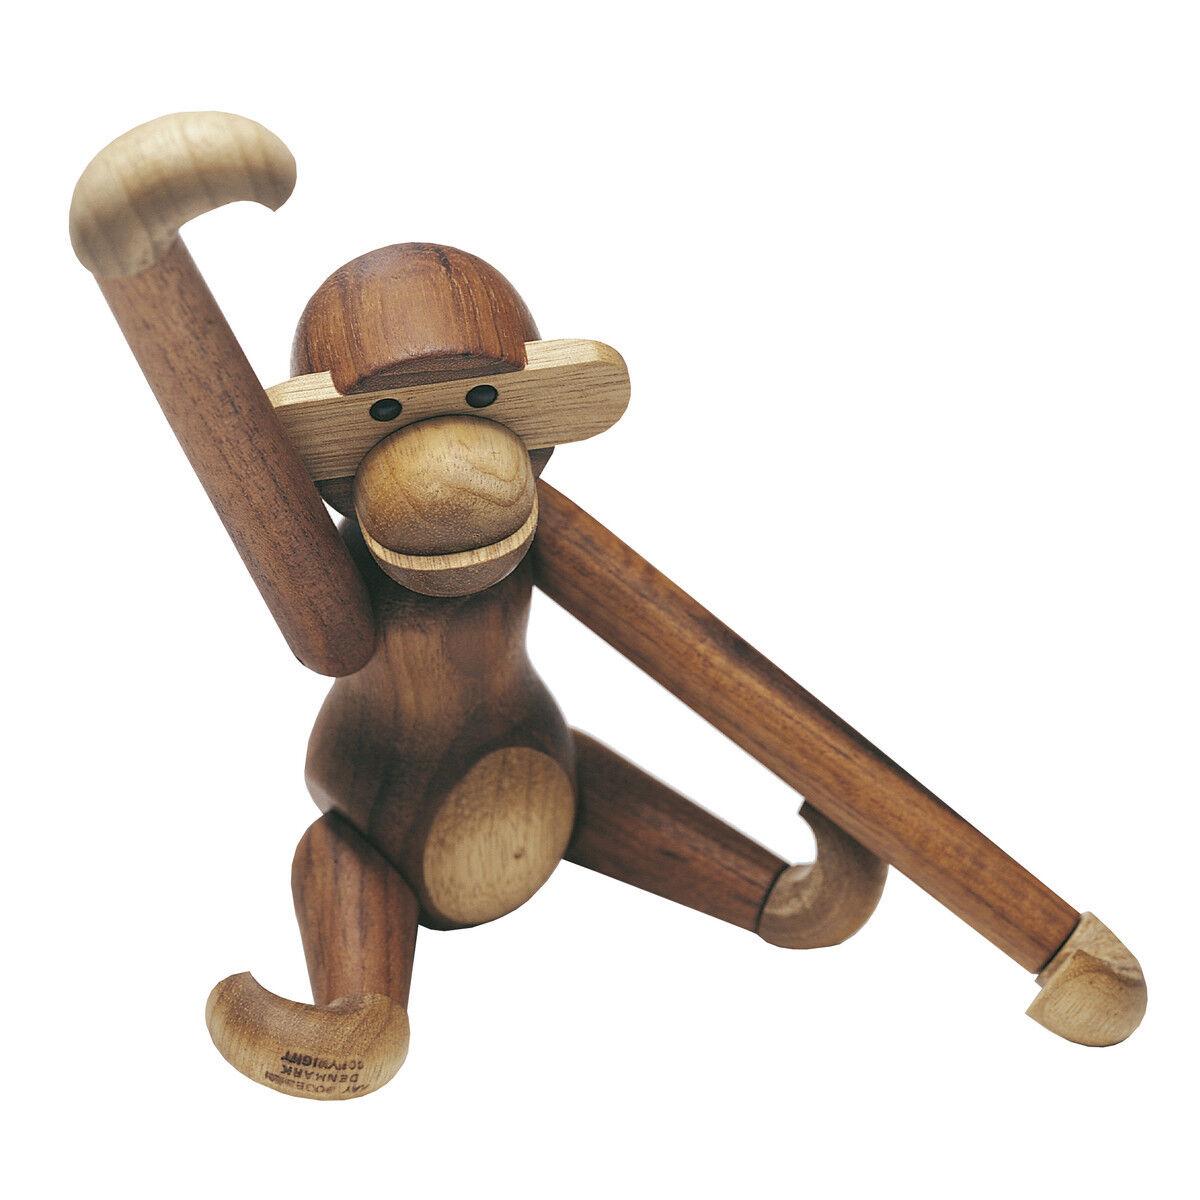 Details About Kay Bojesen Original Monkey Medium Danish Design Wooden Figurines New